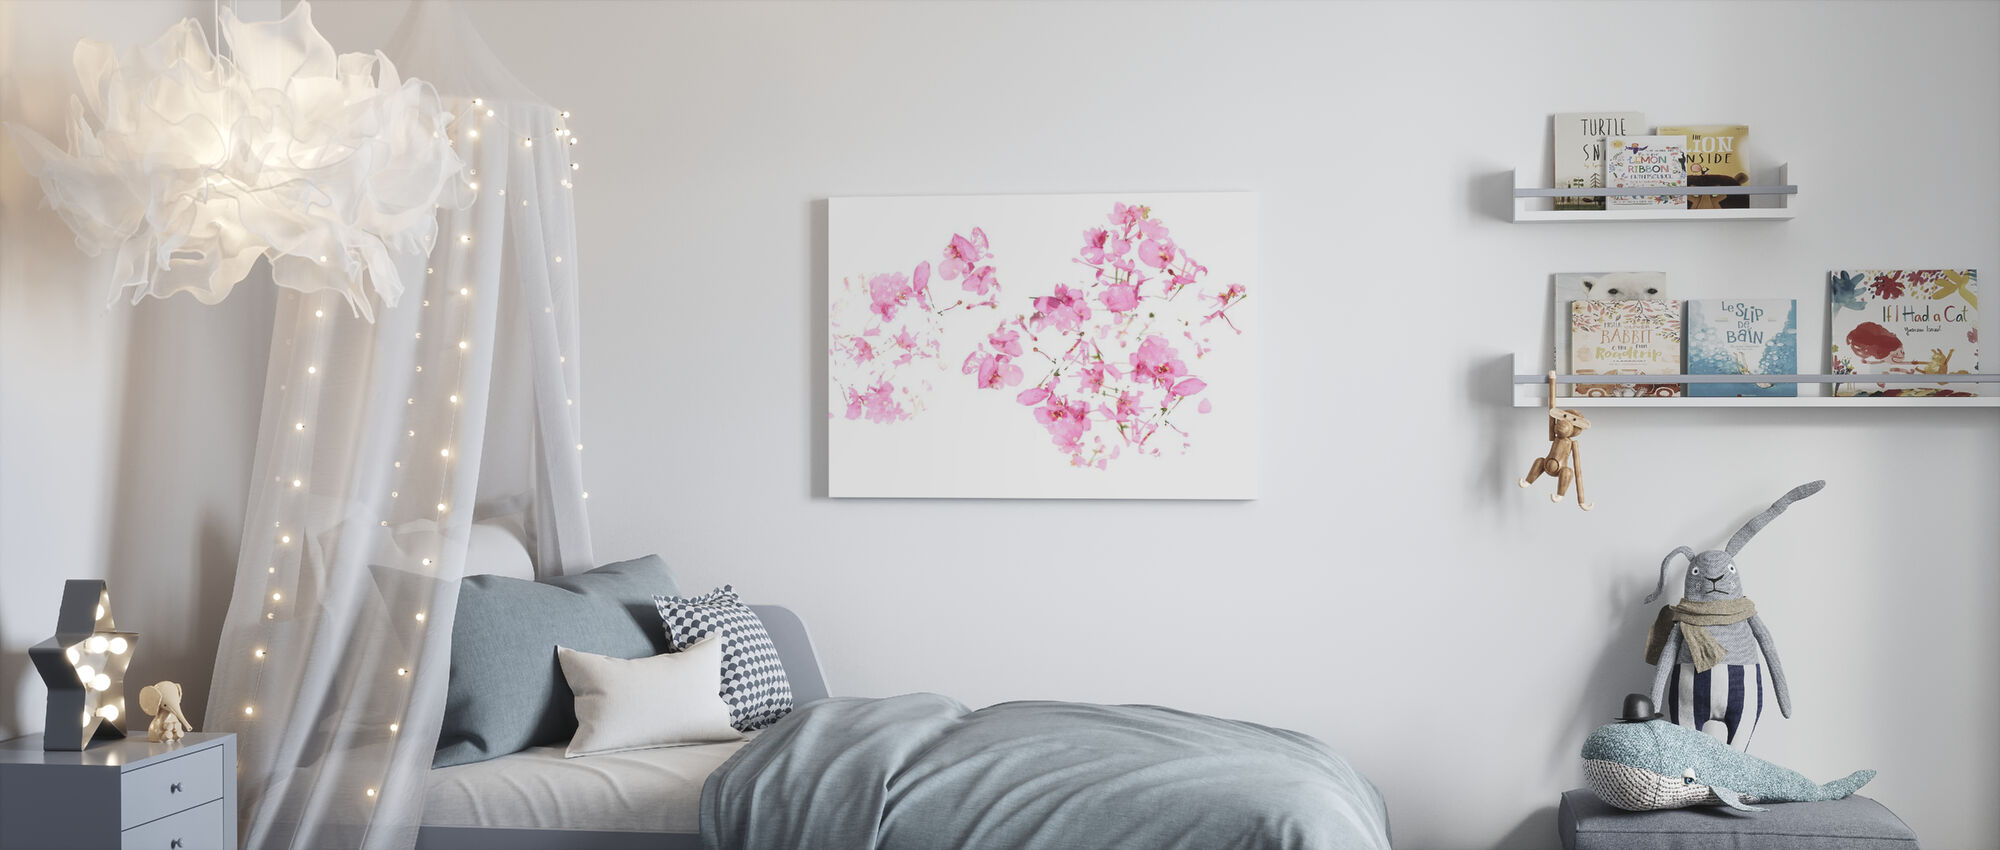 Roze Bloemenstroom - Canvas print - Kinderkamer